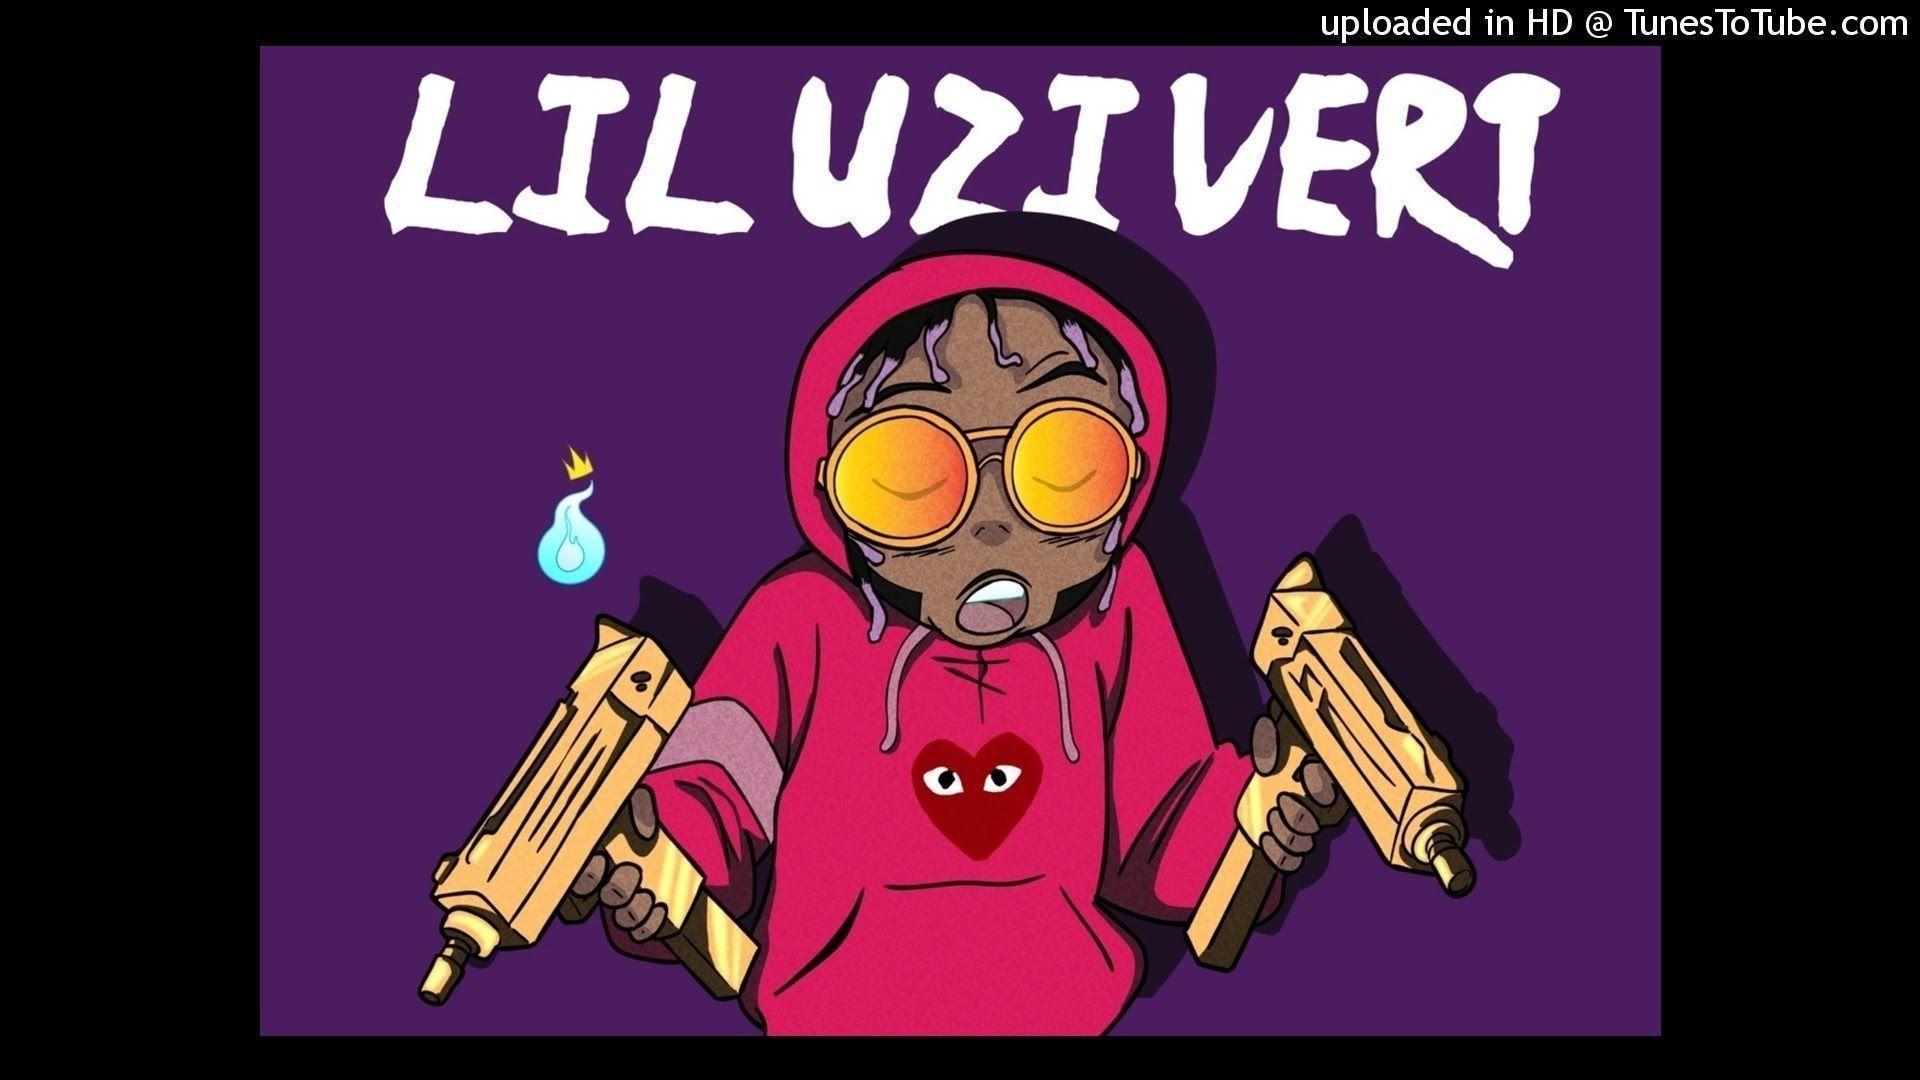 Lil Uzi Vert Cartoon Wallpapers - Wallpaper Cave